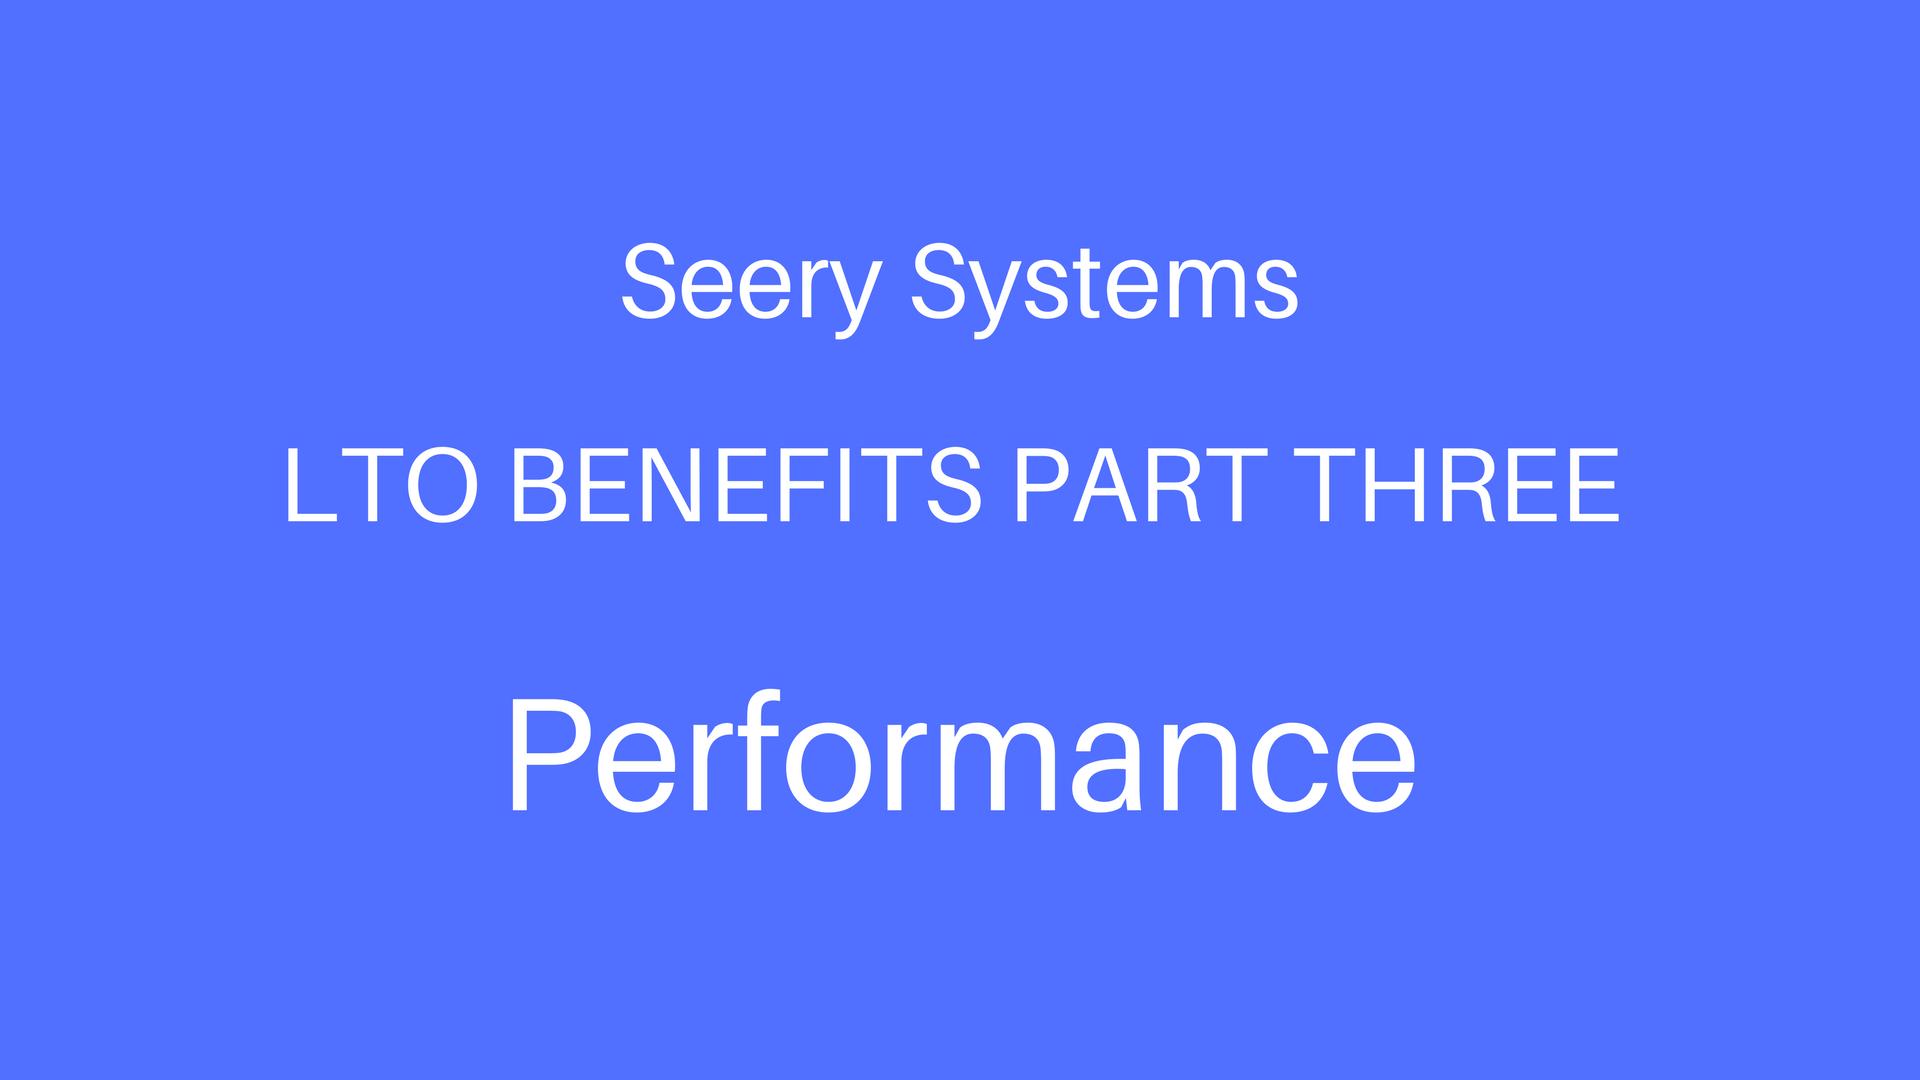 LTO Benefits Part 3 - Performance